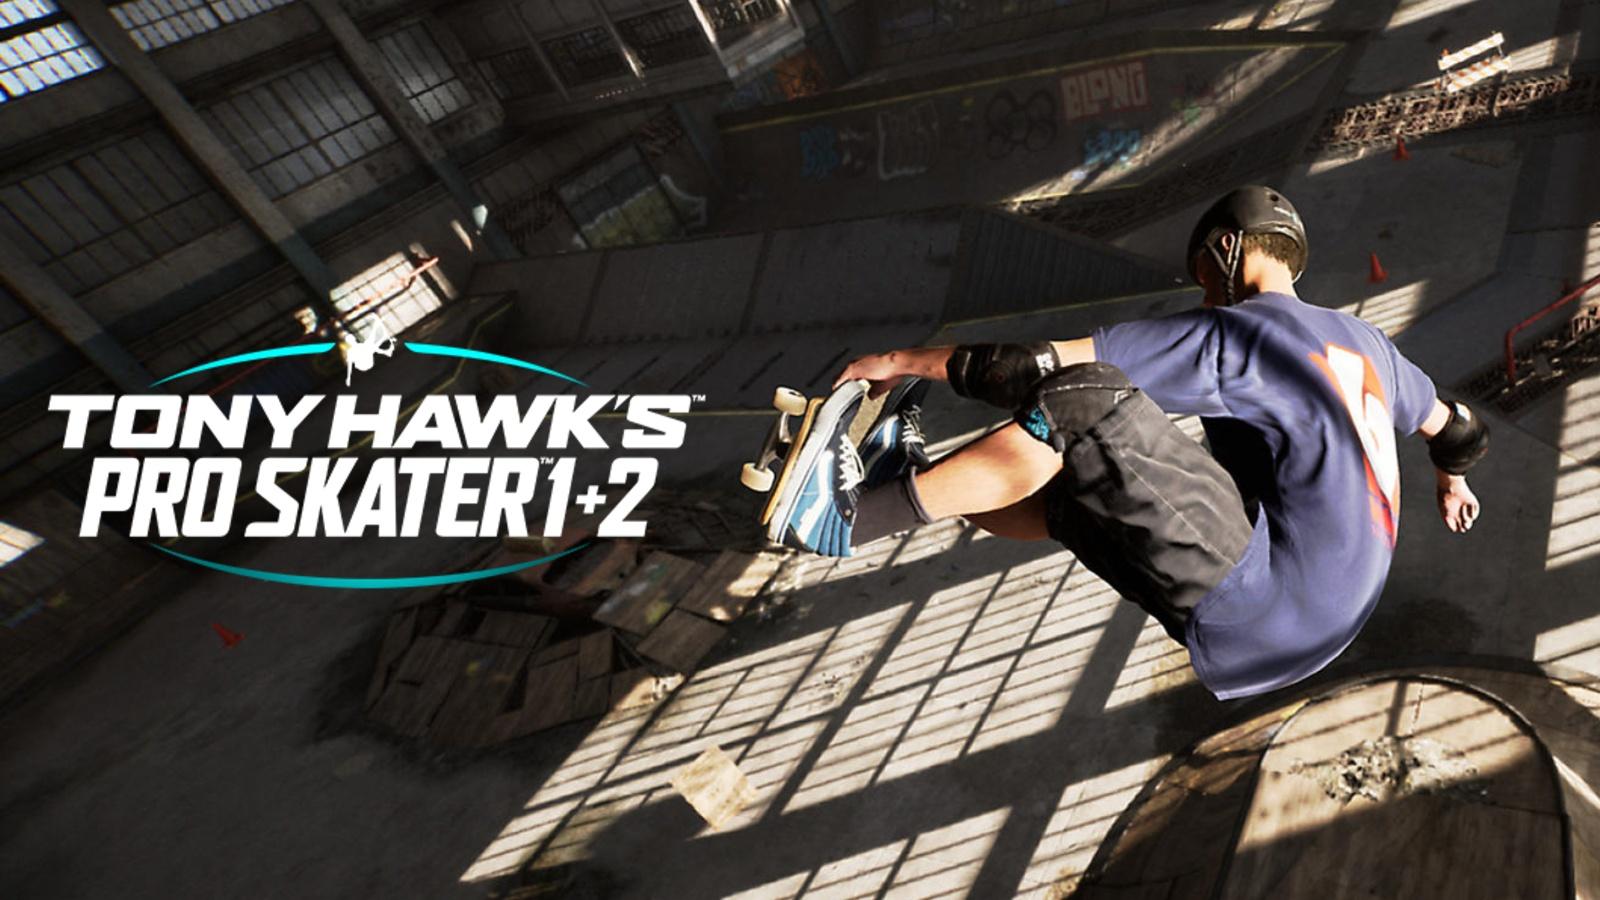 Tony Hawk Pro Skater mute air renamed Weddle Grab